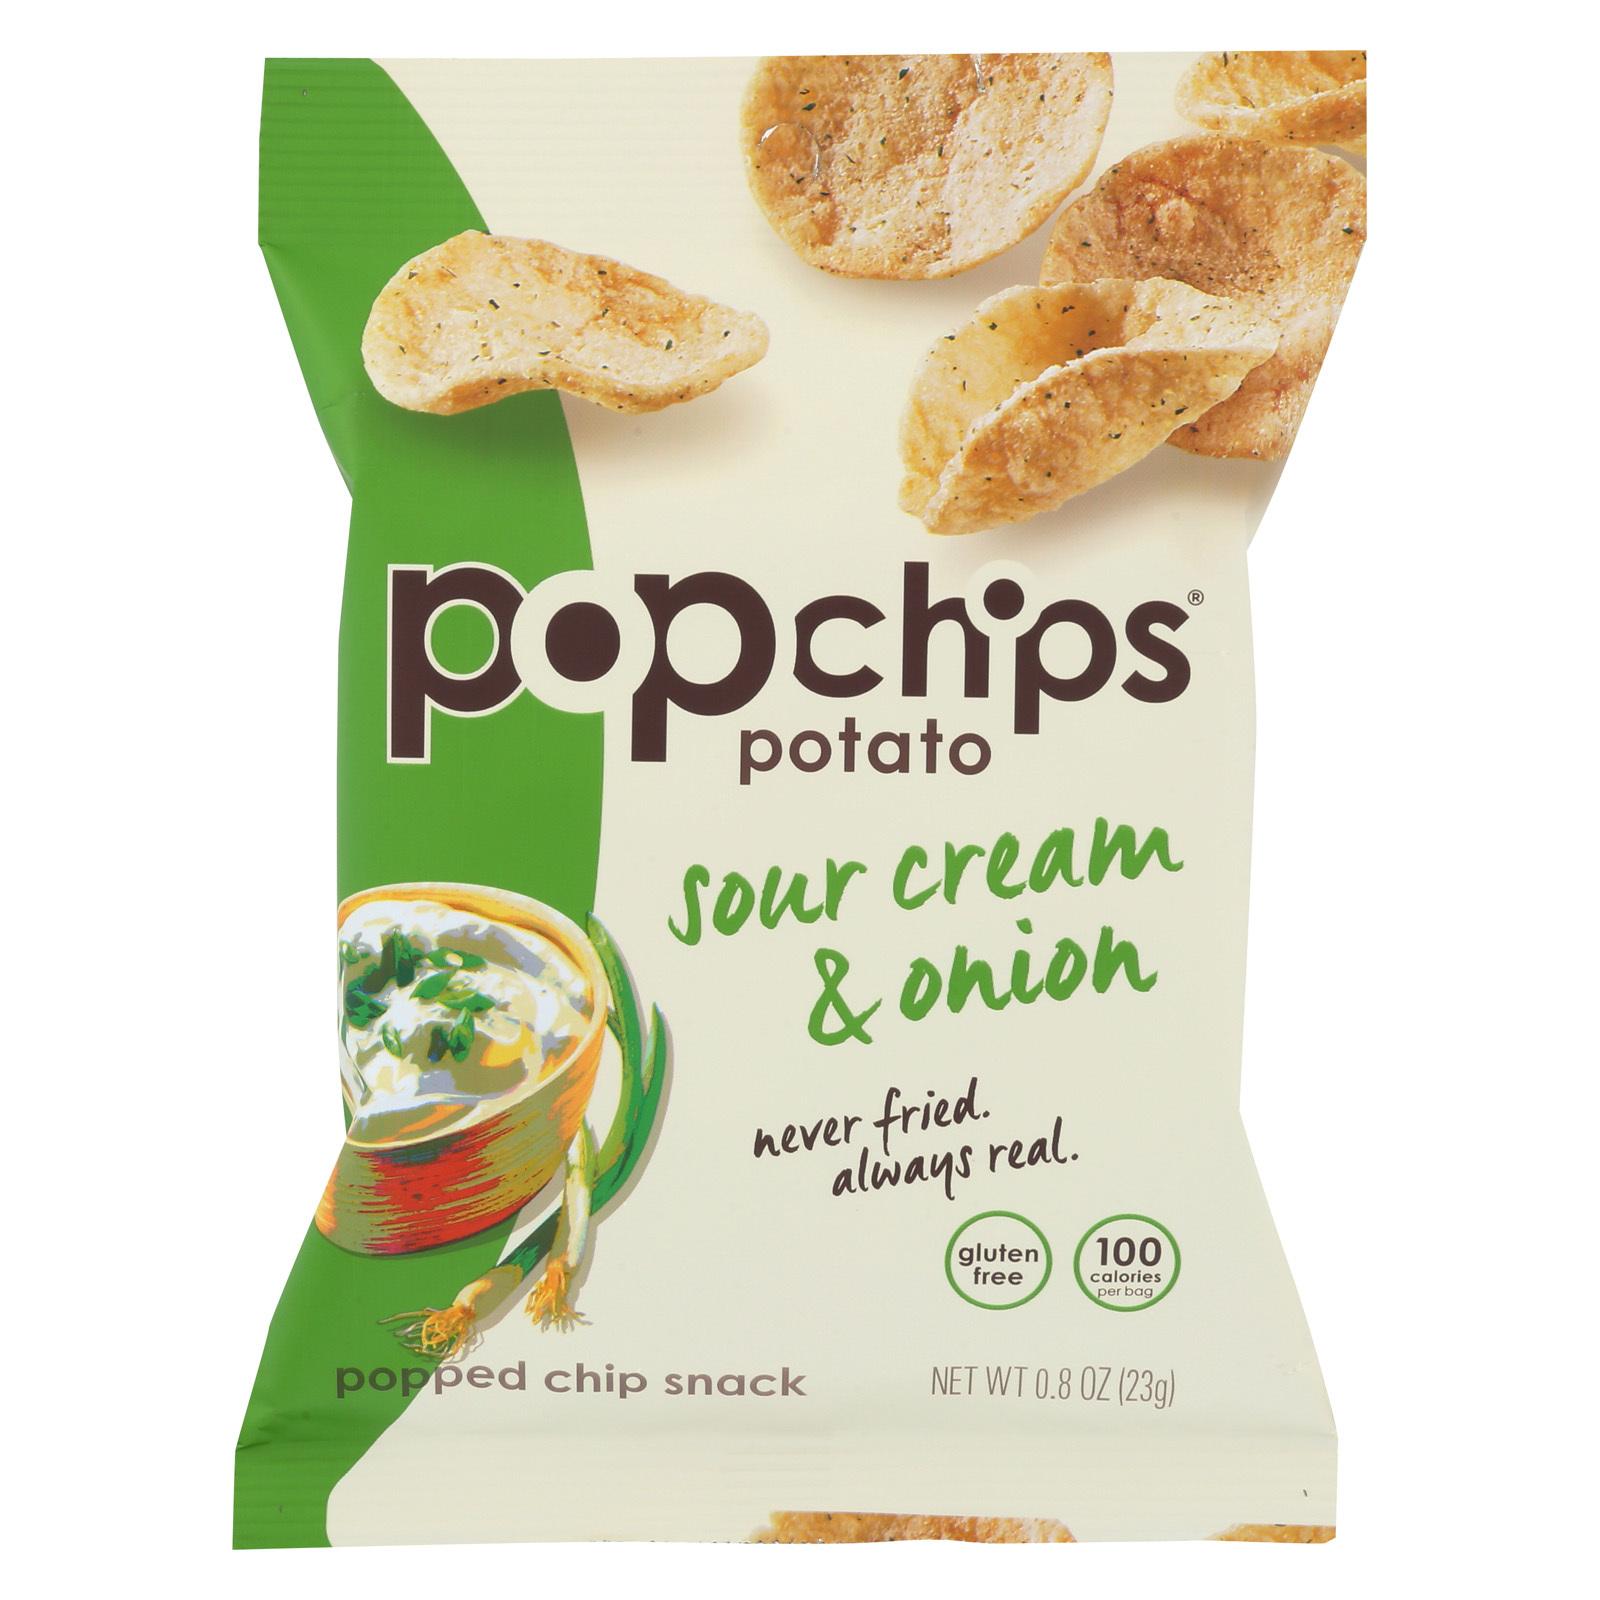 Popchips Potato Chip - Sour Cream and Onion - Case of 24 - 0.8 oz.